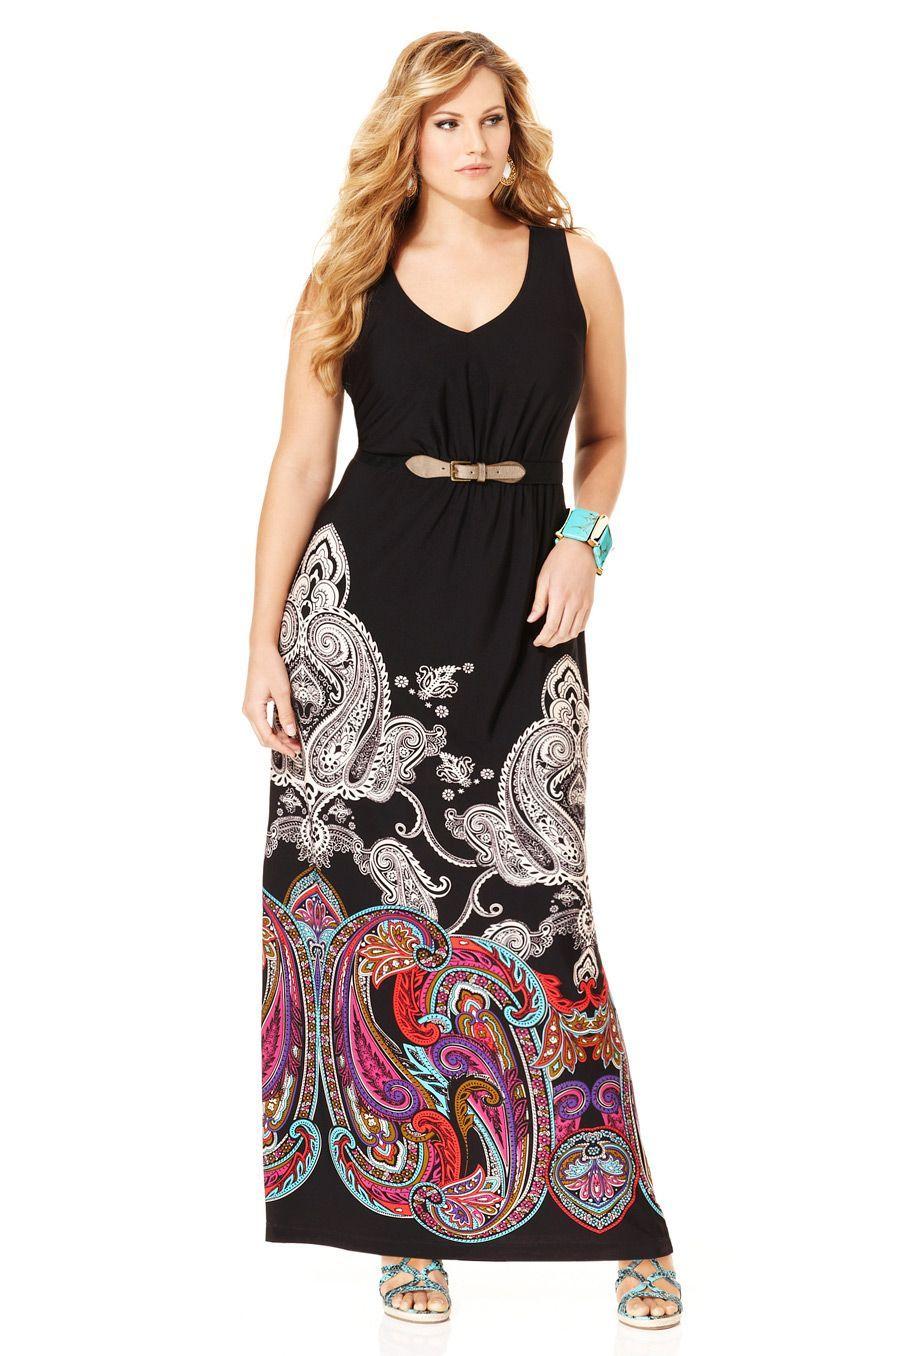 Pin By Candi On My Style Maxi Dress Plus Size Fashionista Plus Size Maxi Dresses [ 1356 x 924 Pixel ]